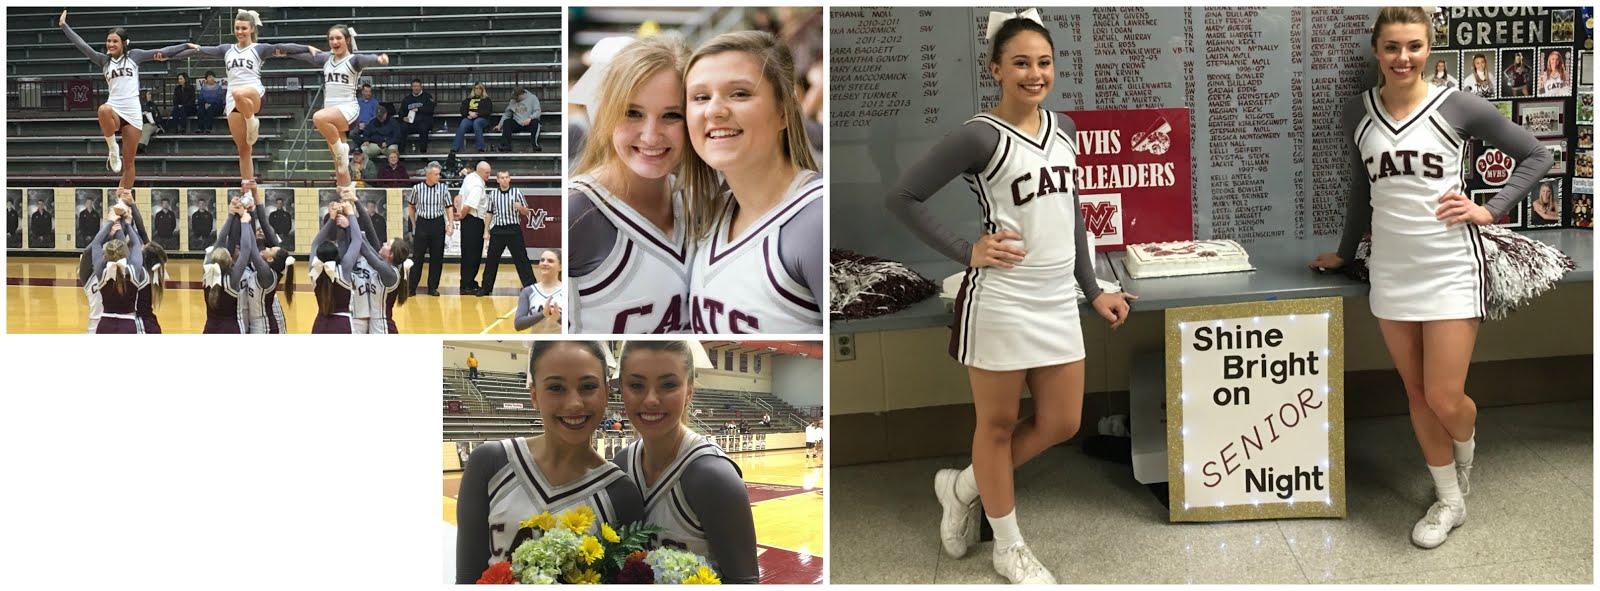 Mount Vernon High School cheerleaders showing off their new uniforms.